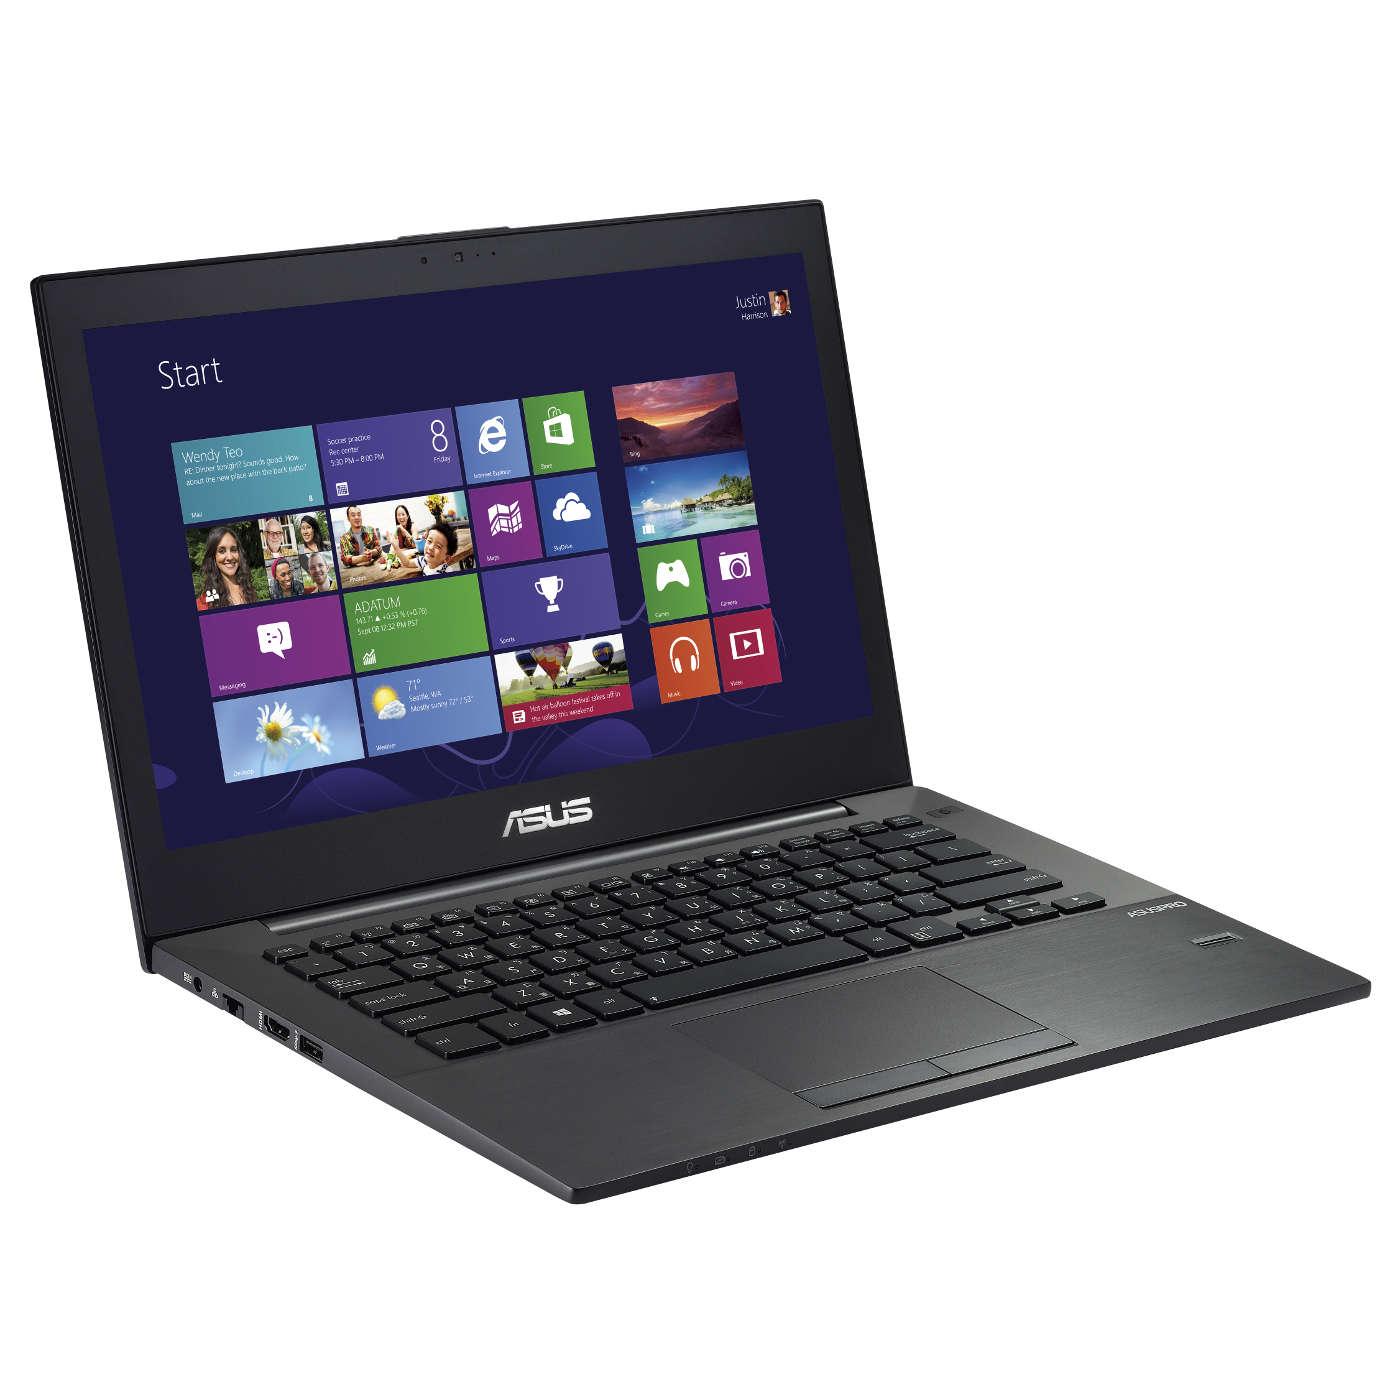 "PC portable ASUS BU401LA-CZ084G Intel Core i5-4285U 6 Go SSHD 500 Go 14"" LED Wi-Fi N/Bluetooth Webcam Windows 7 Professionnel 64 bits + Windows 8.1 Pro 64 bits (garantie constructeur 2 ans)"